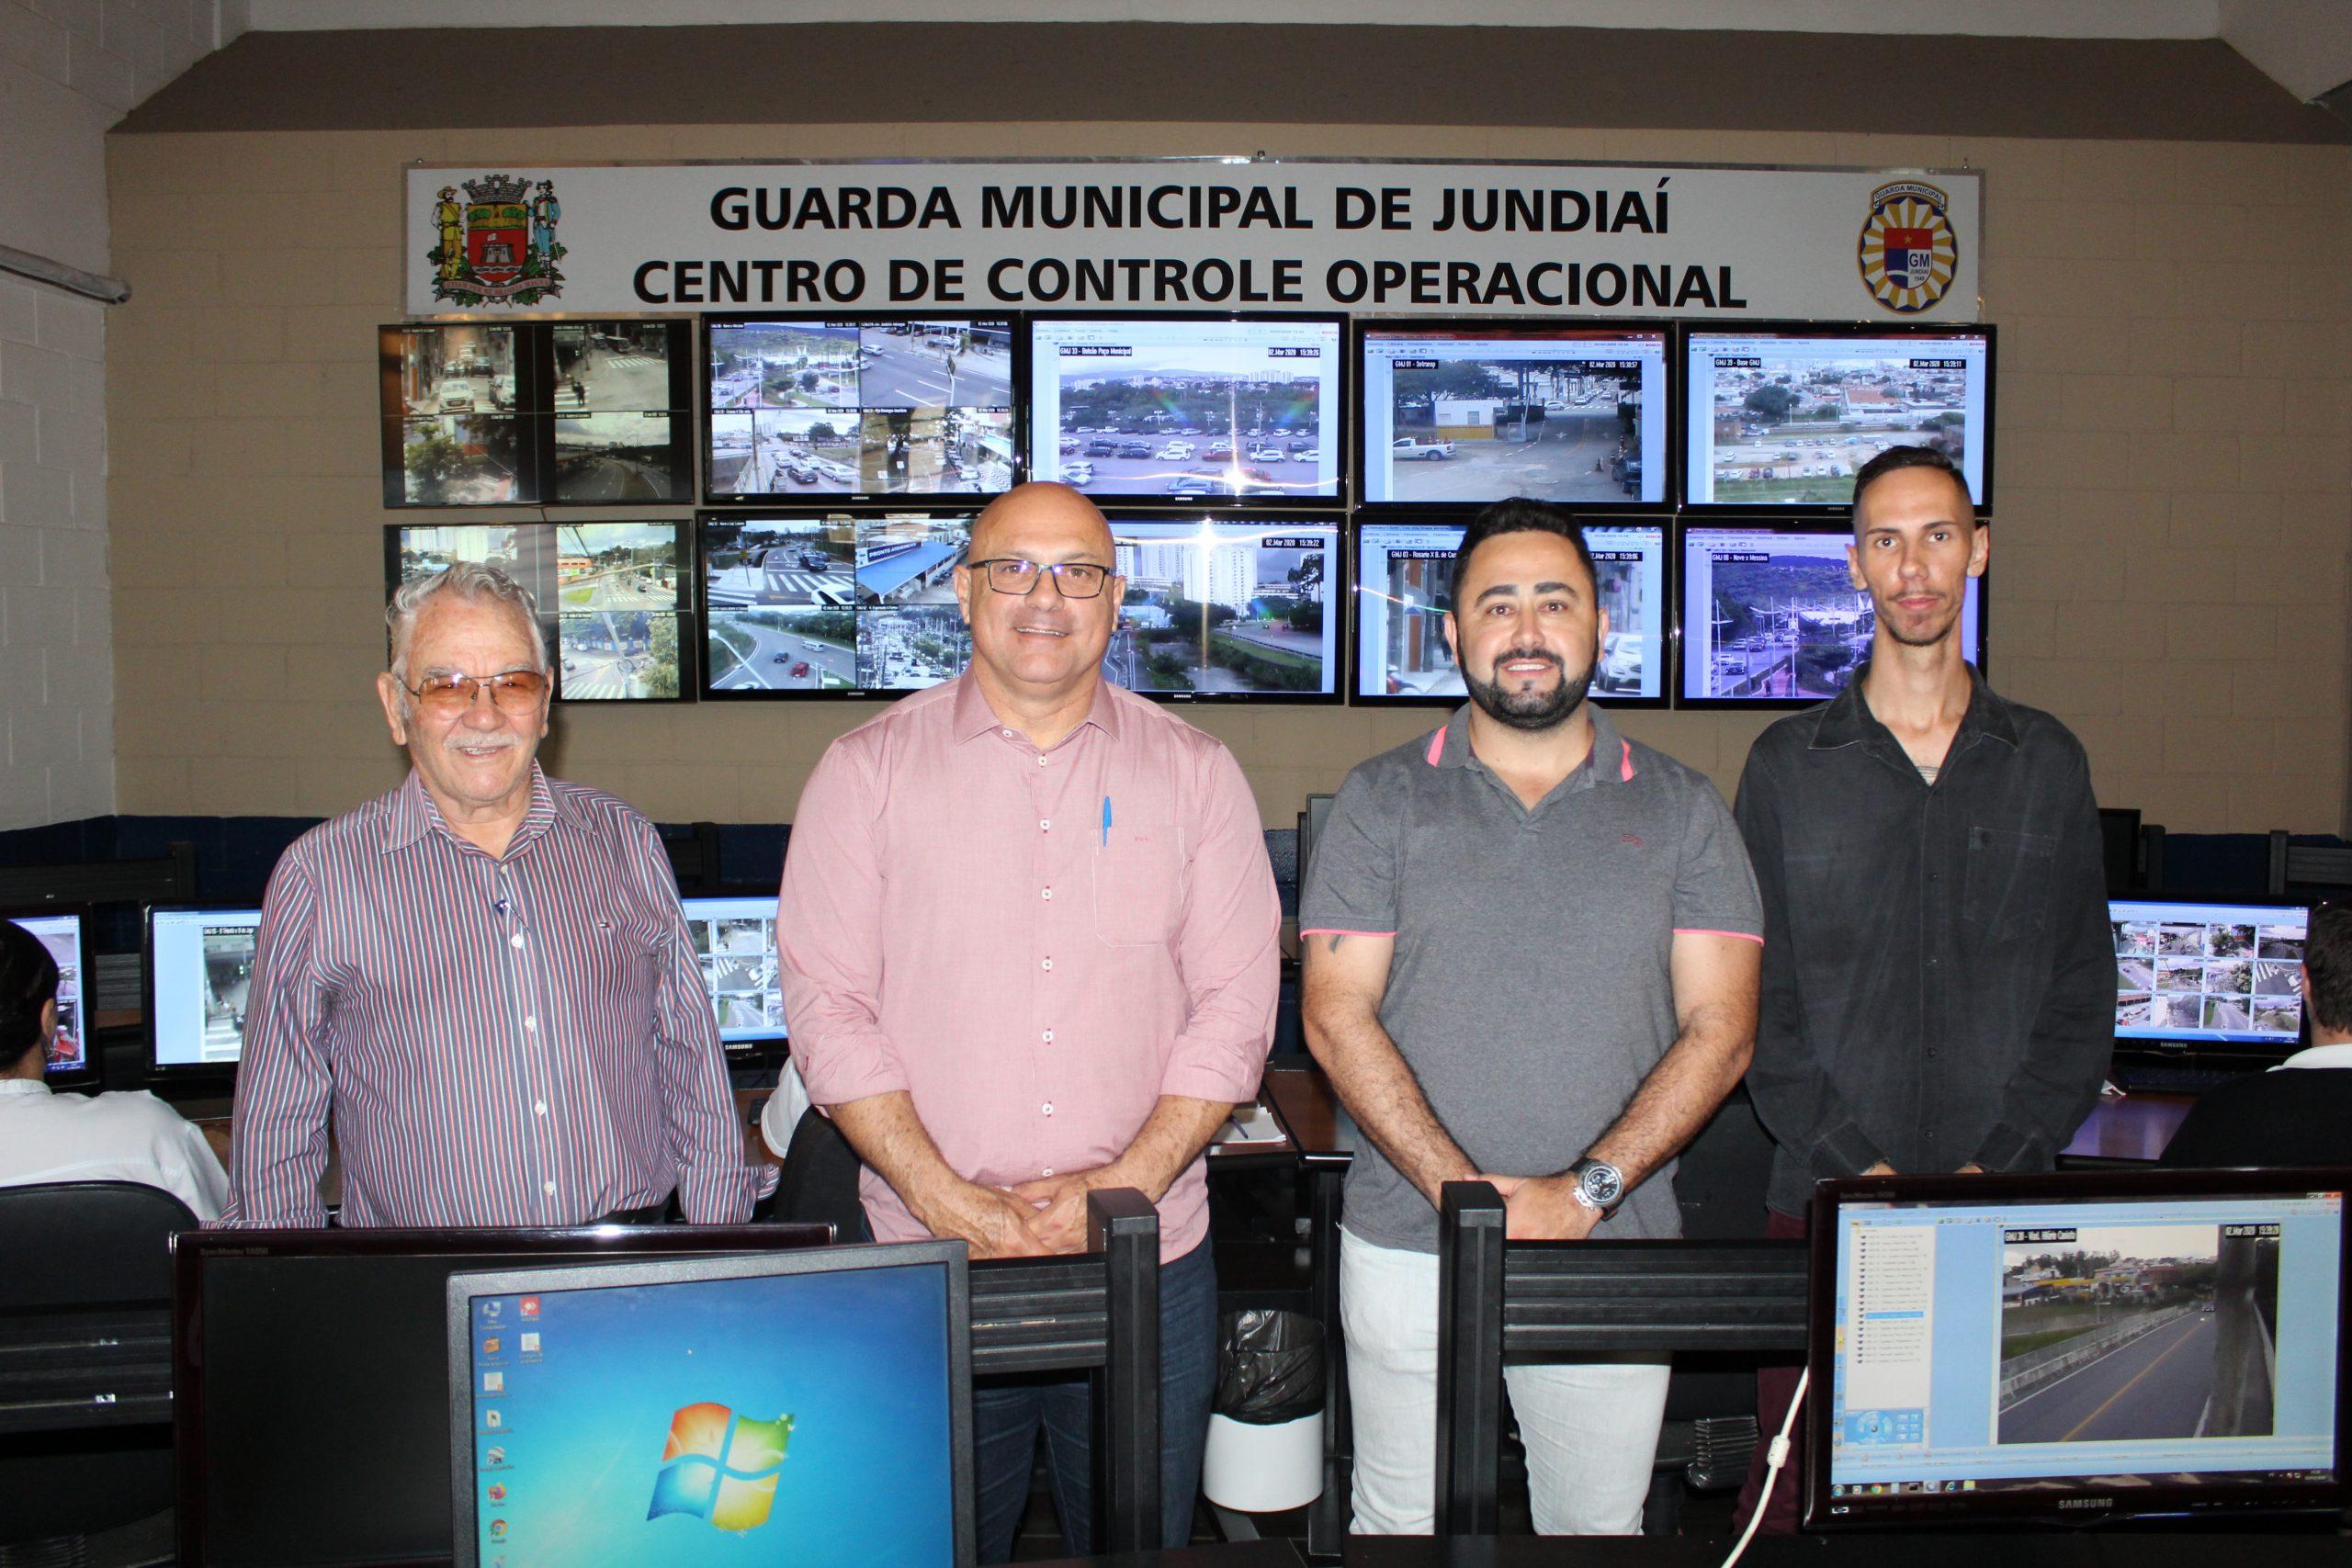 Gestor de Segurança visita Central de Monitoramento jundiaiense